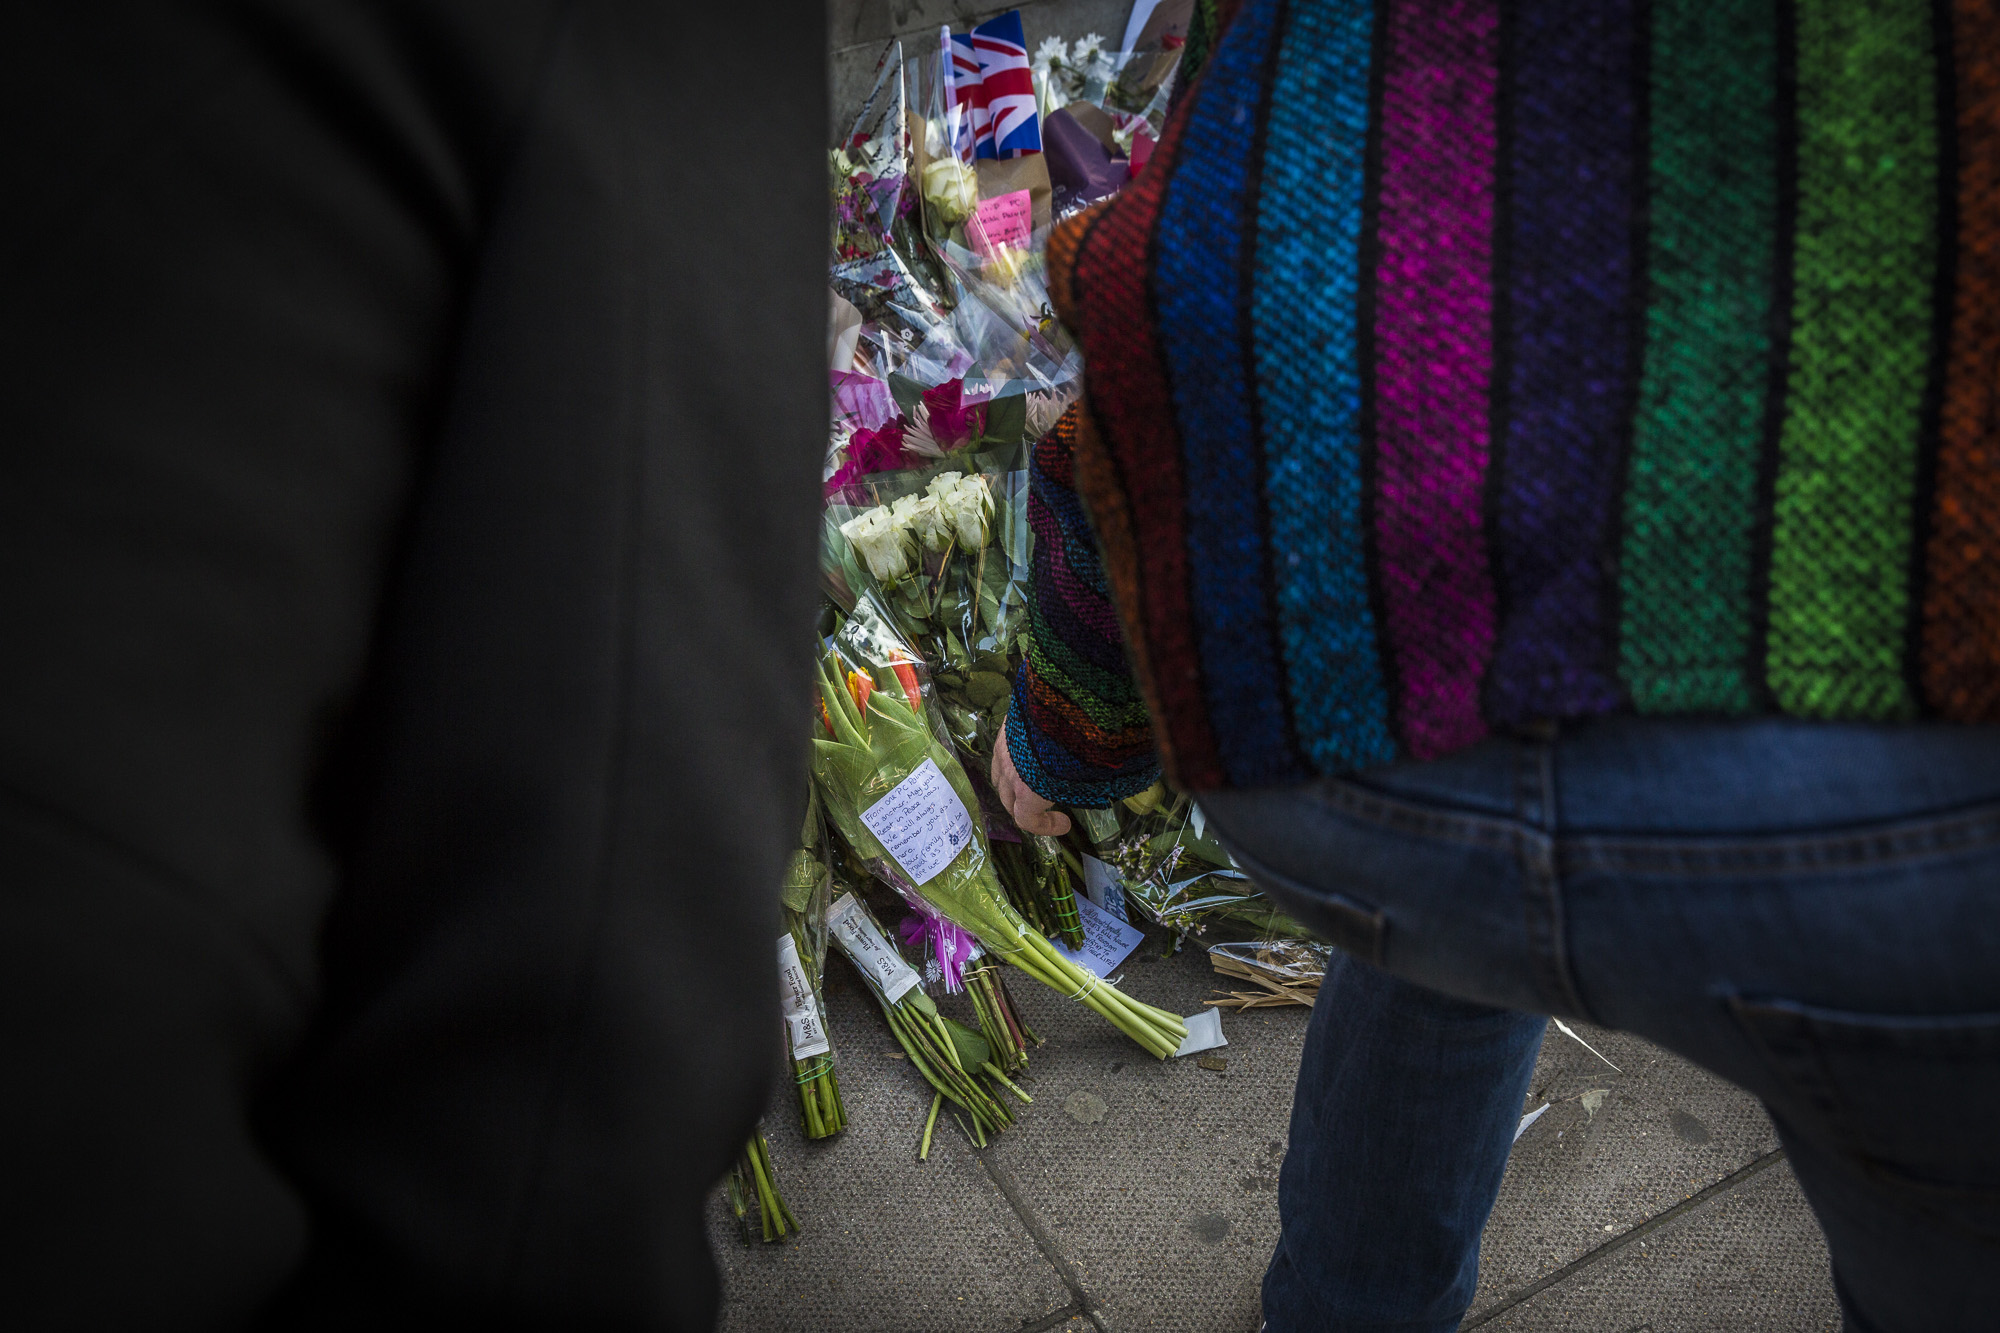 London_Attack_Hope_Not_Hate-23.jpg